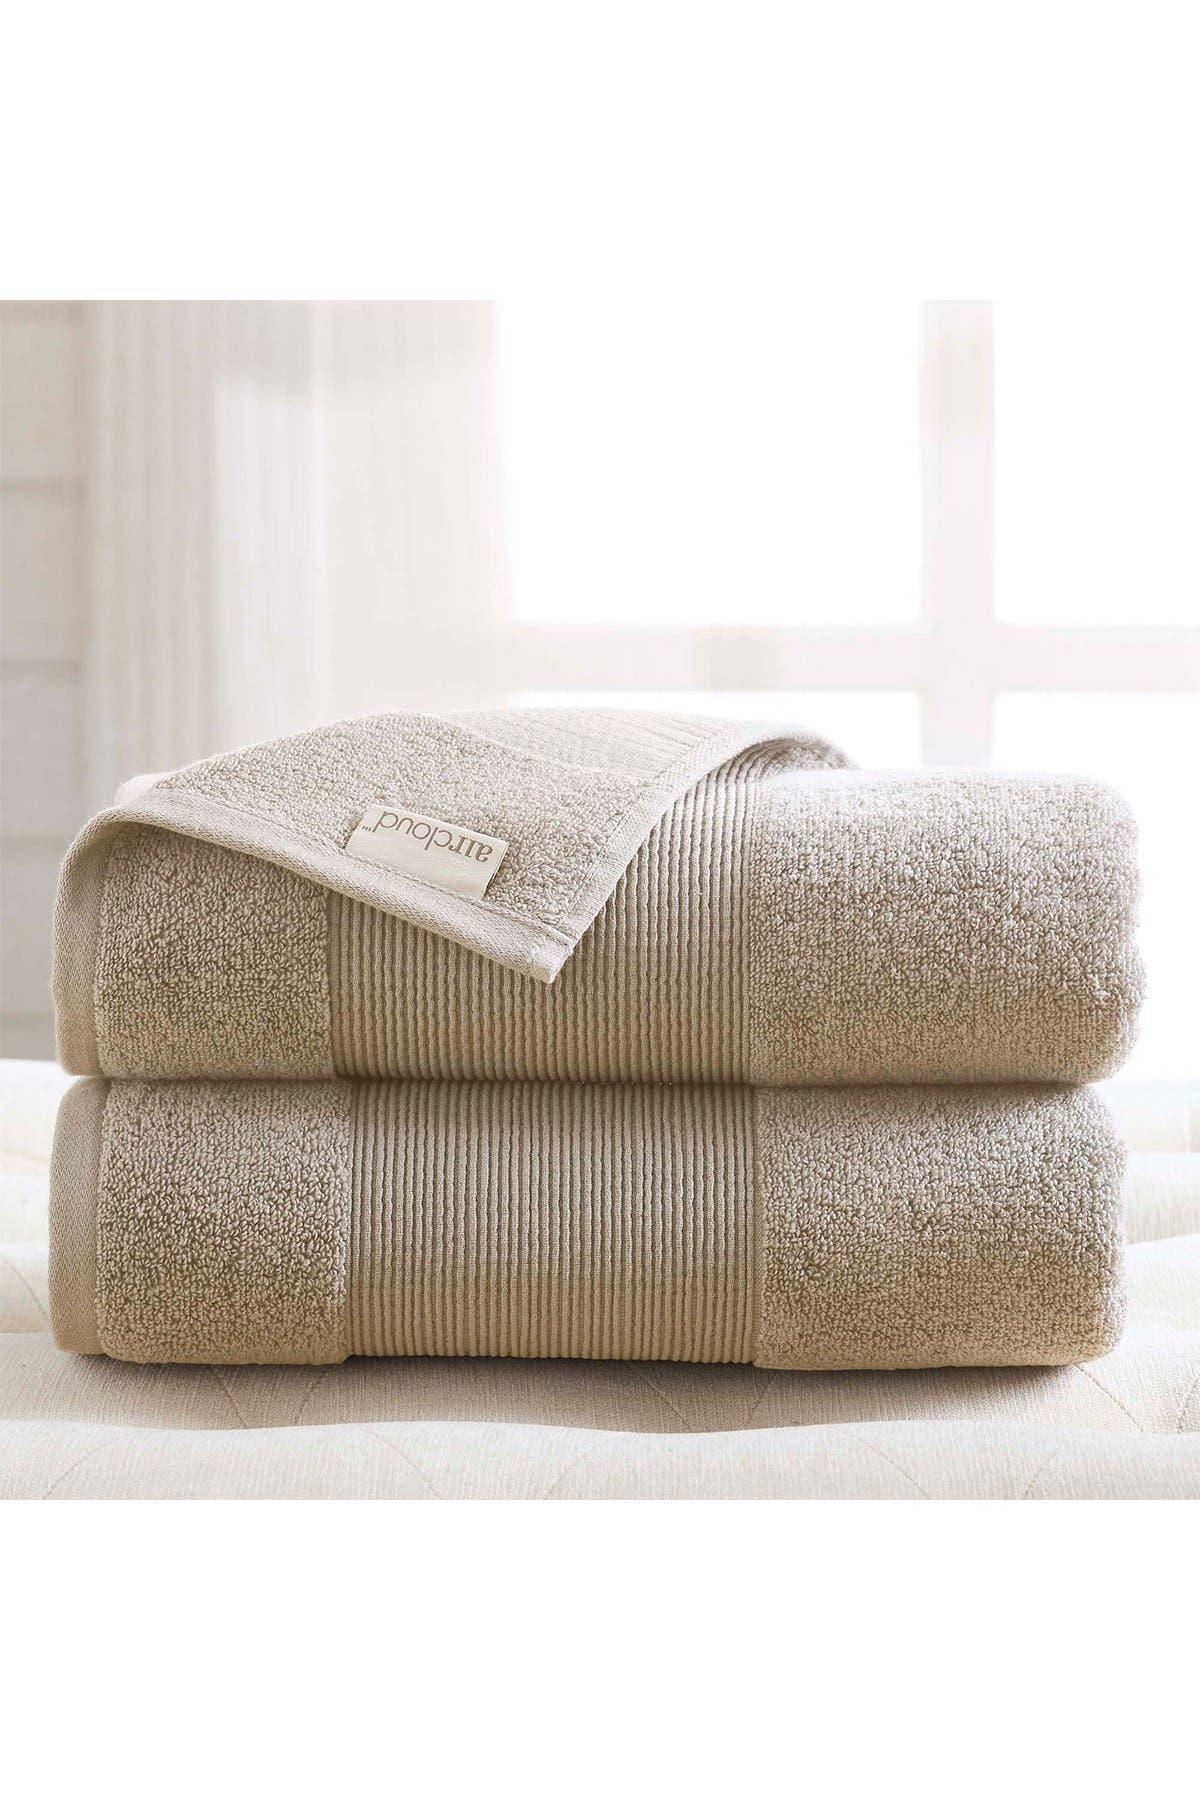 Image of Modern Threads Air Cloud Oversized Bath Sheet - Set of 2 - Sand